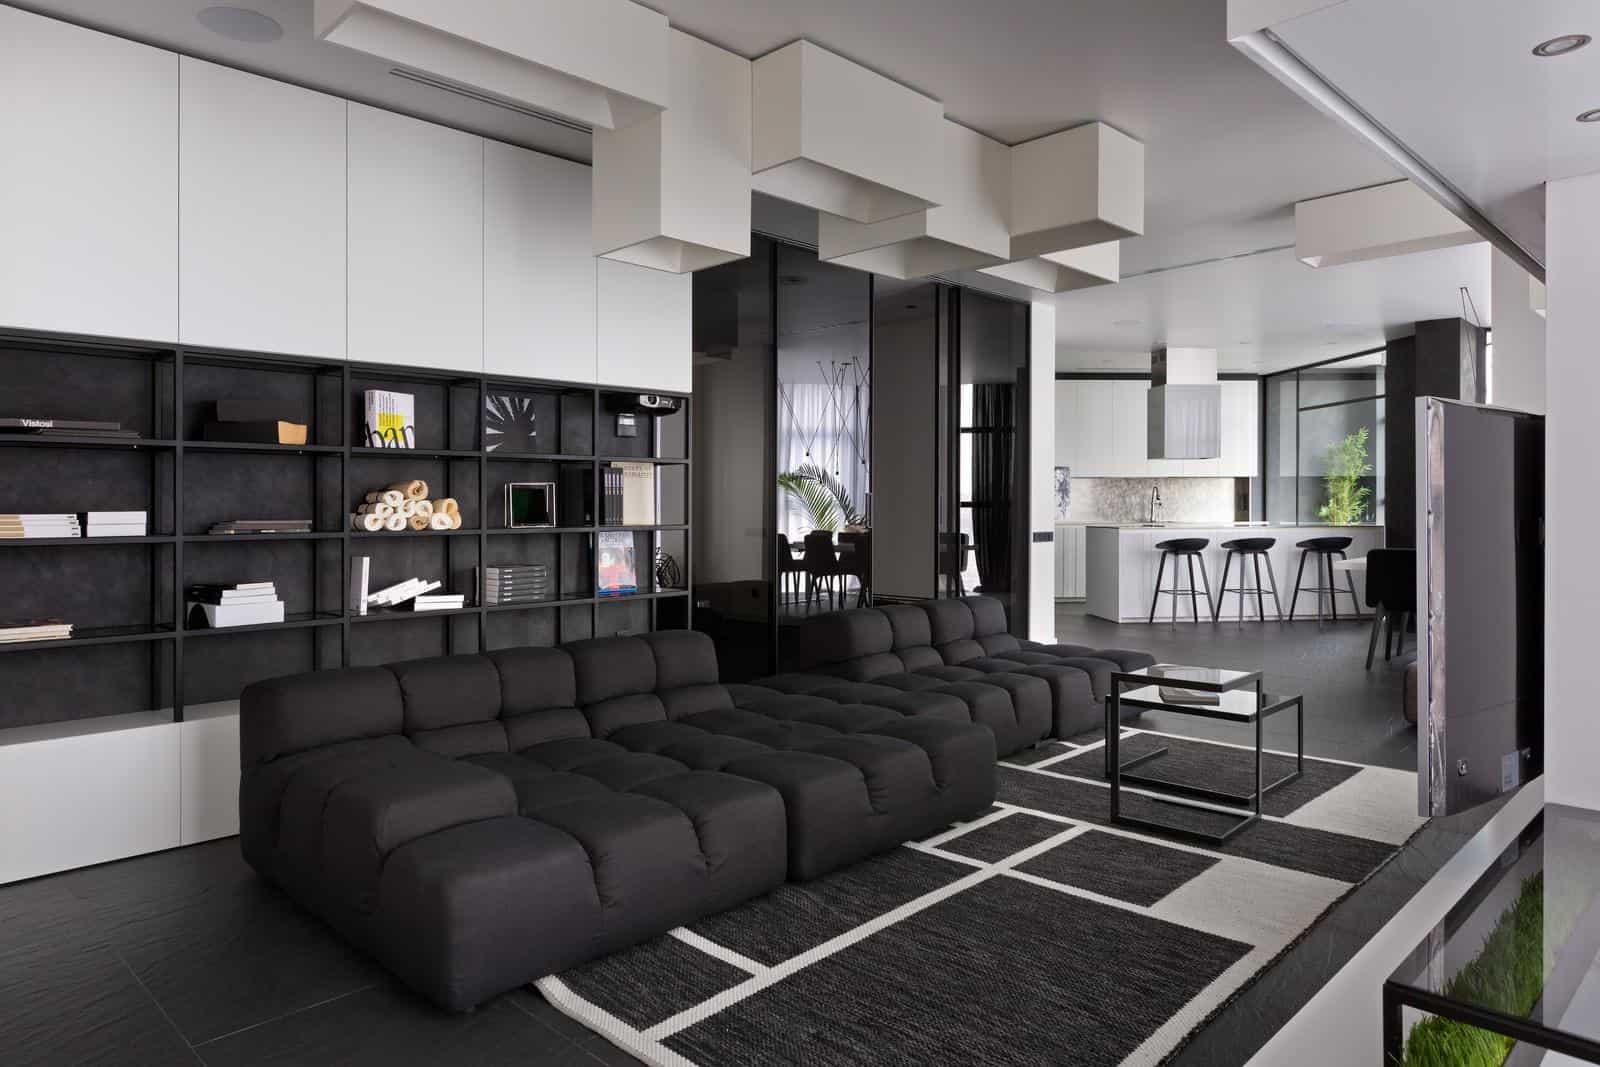 thiet-ke-noi-that-chung-cu-mai-dich-8 Thiết kế nội thất chung cư Mai Dịch - A. Sinh